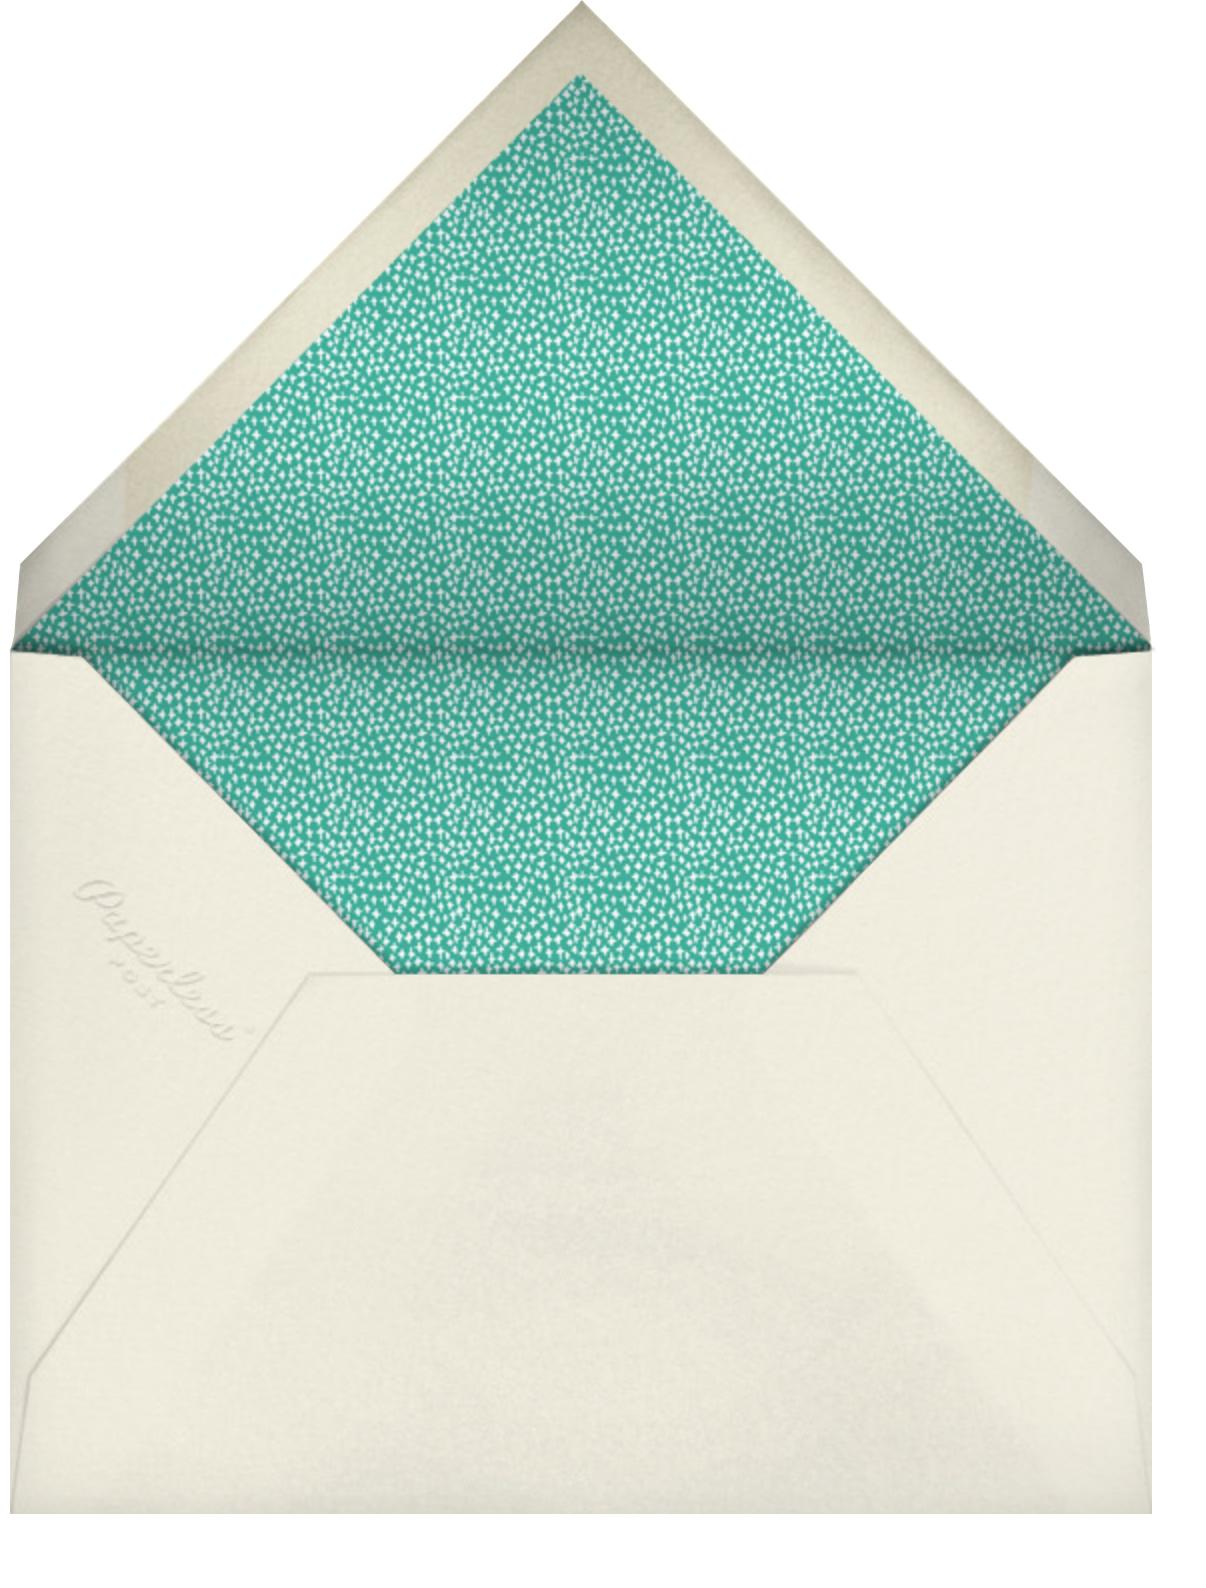 Wrapped Up Nicely - Mr. Boddington's Studio - Christmas party - envelope back